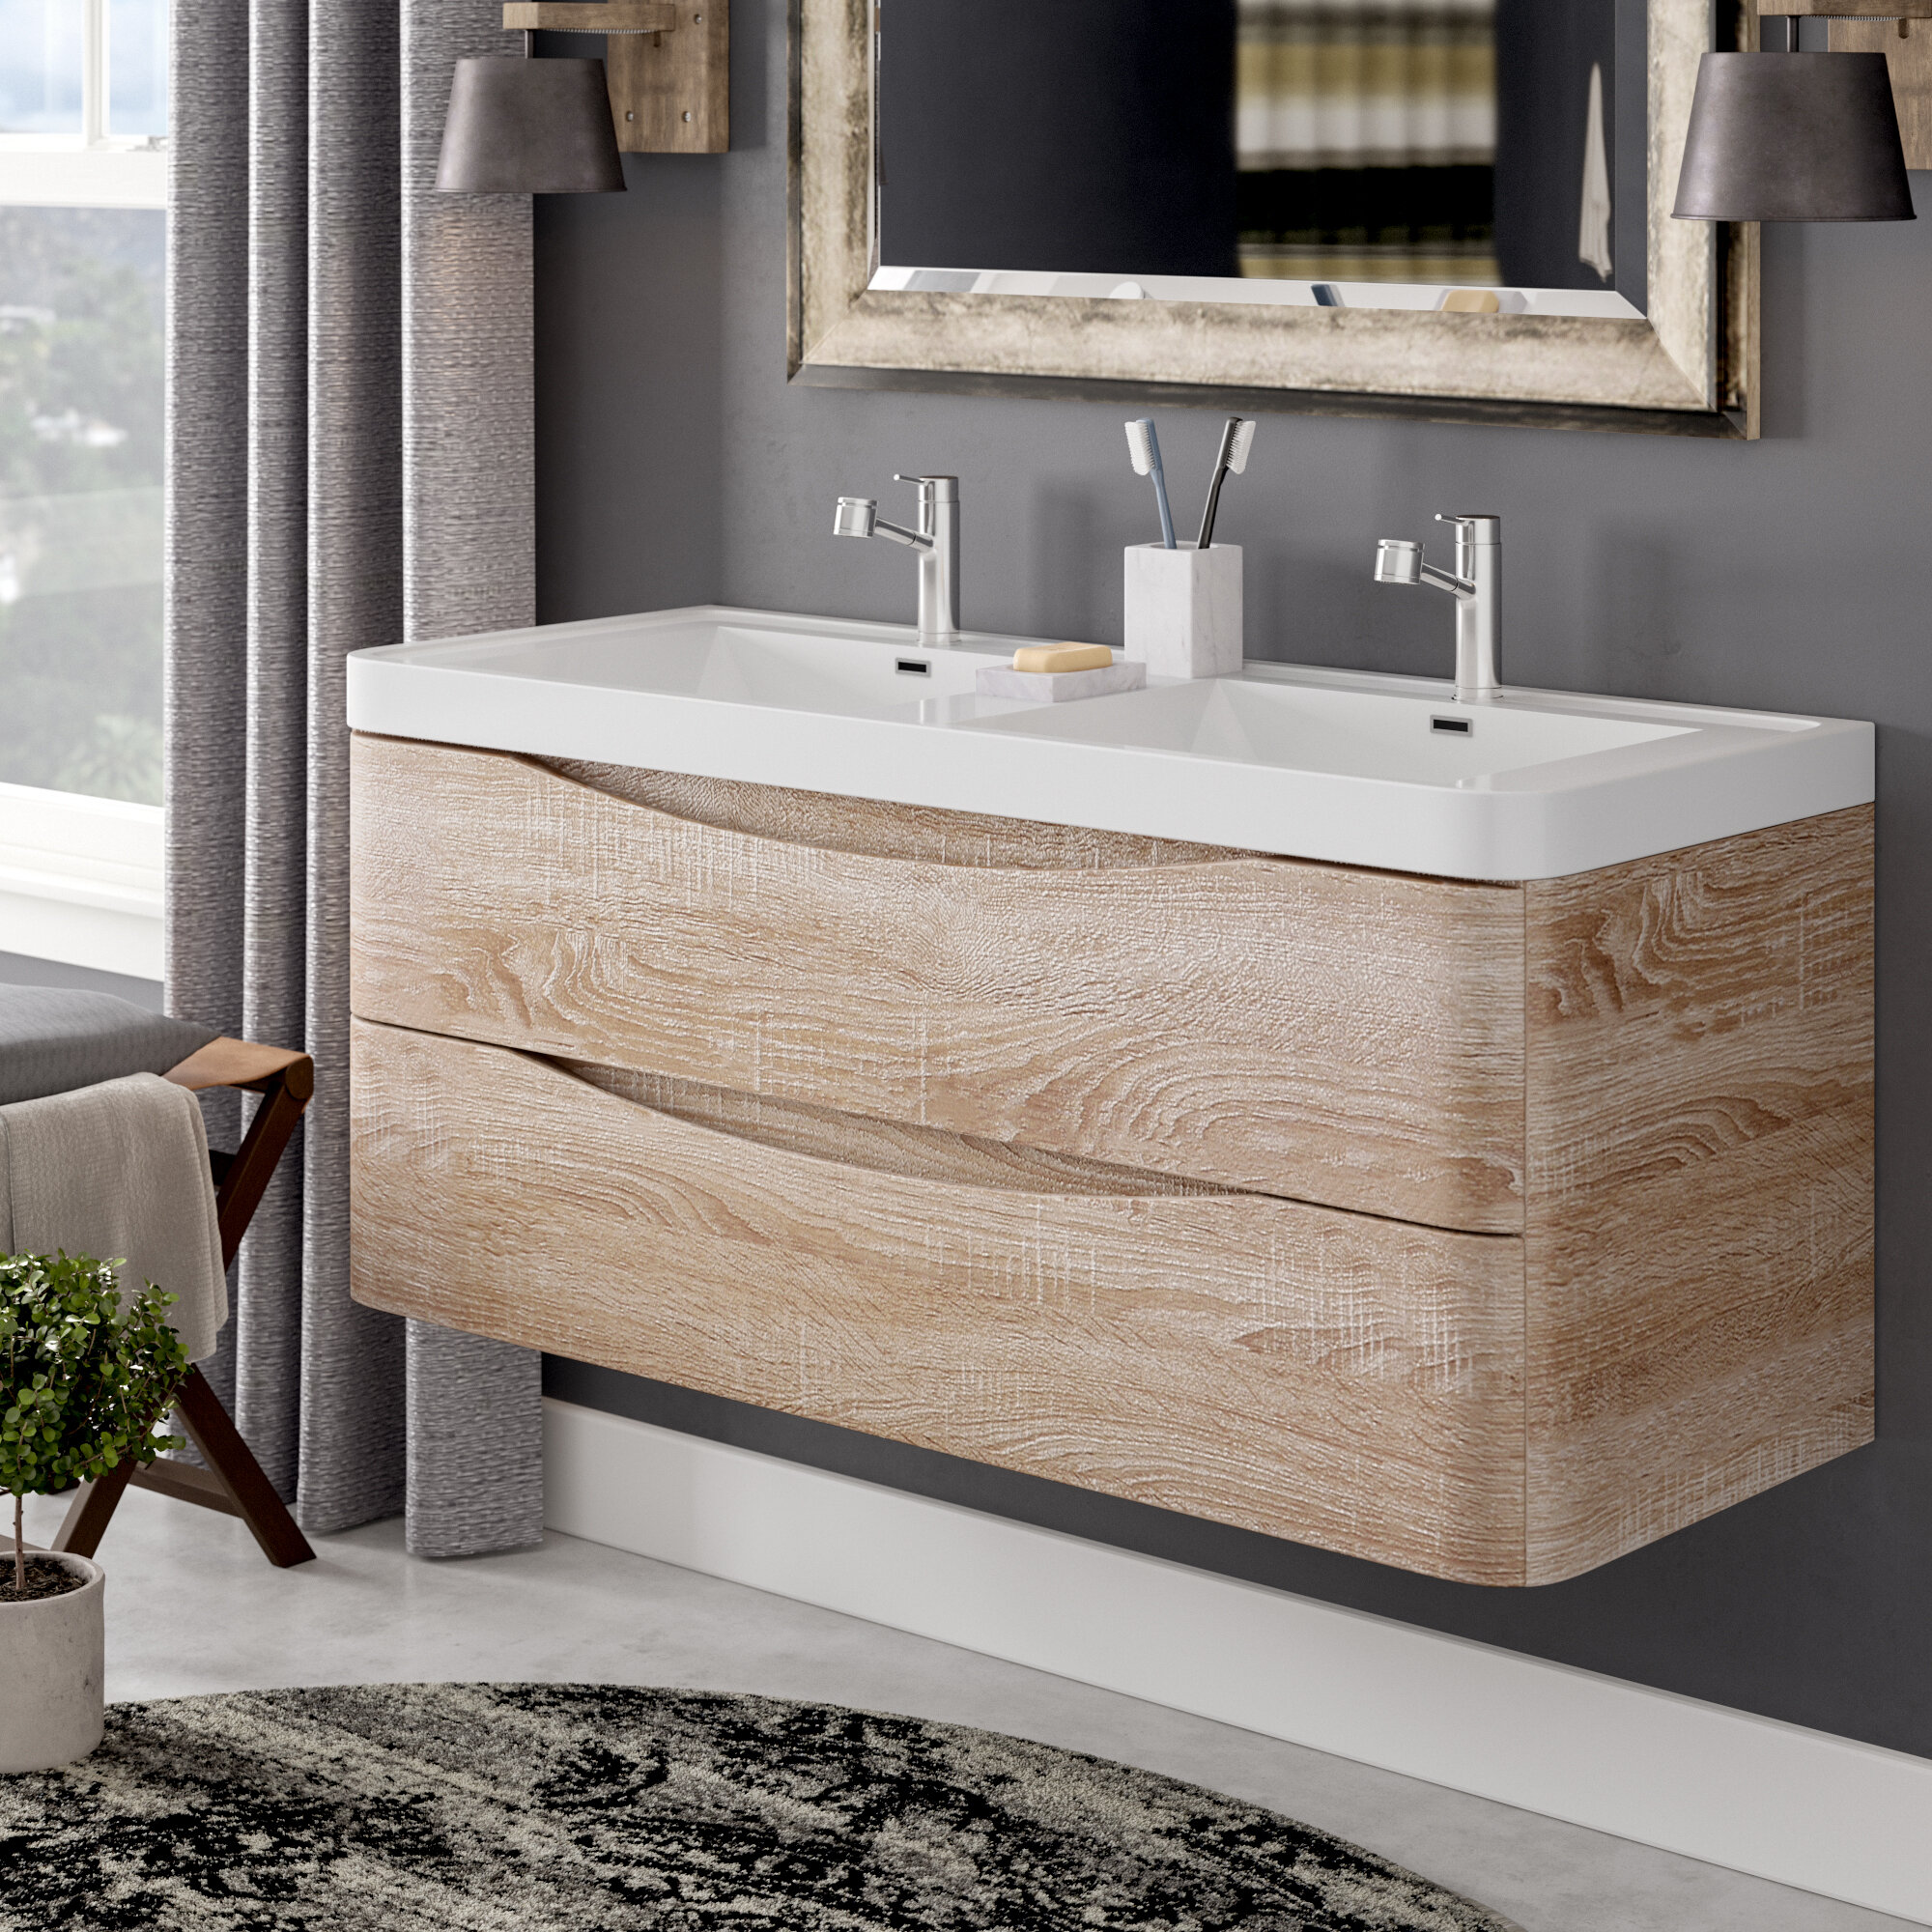 Union Rustic Corso Modern 48 Double Bathroom Vanity Set Reviews Wayfair